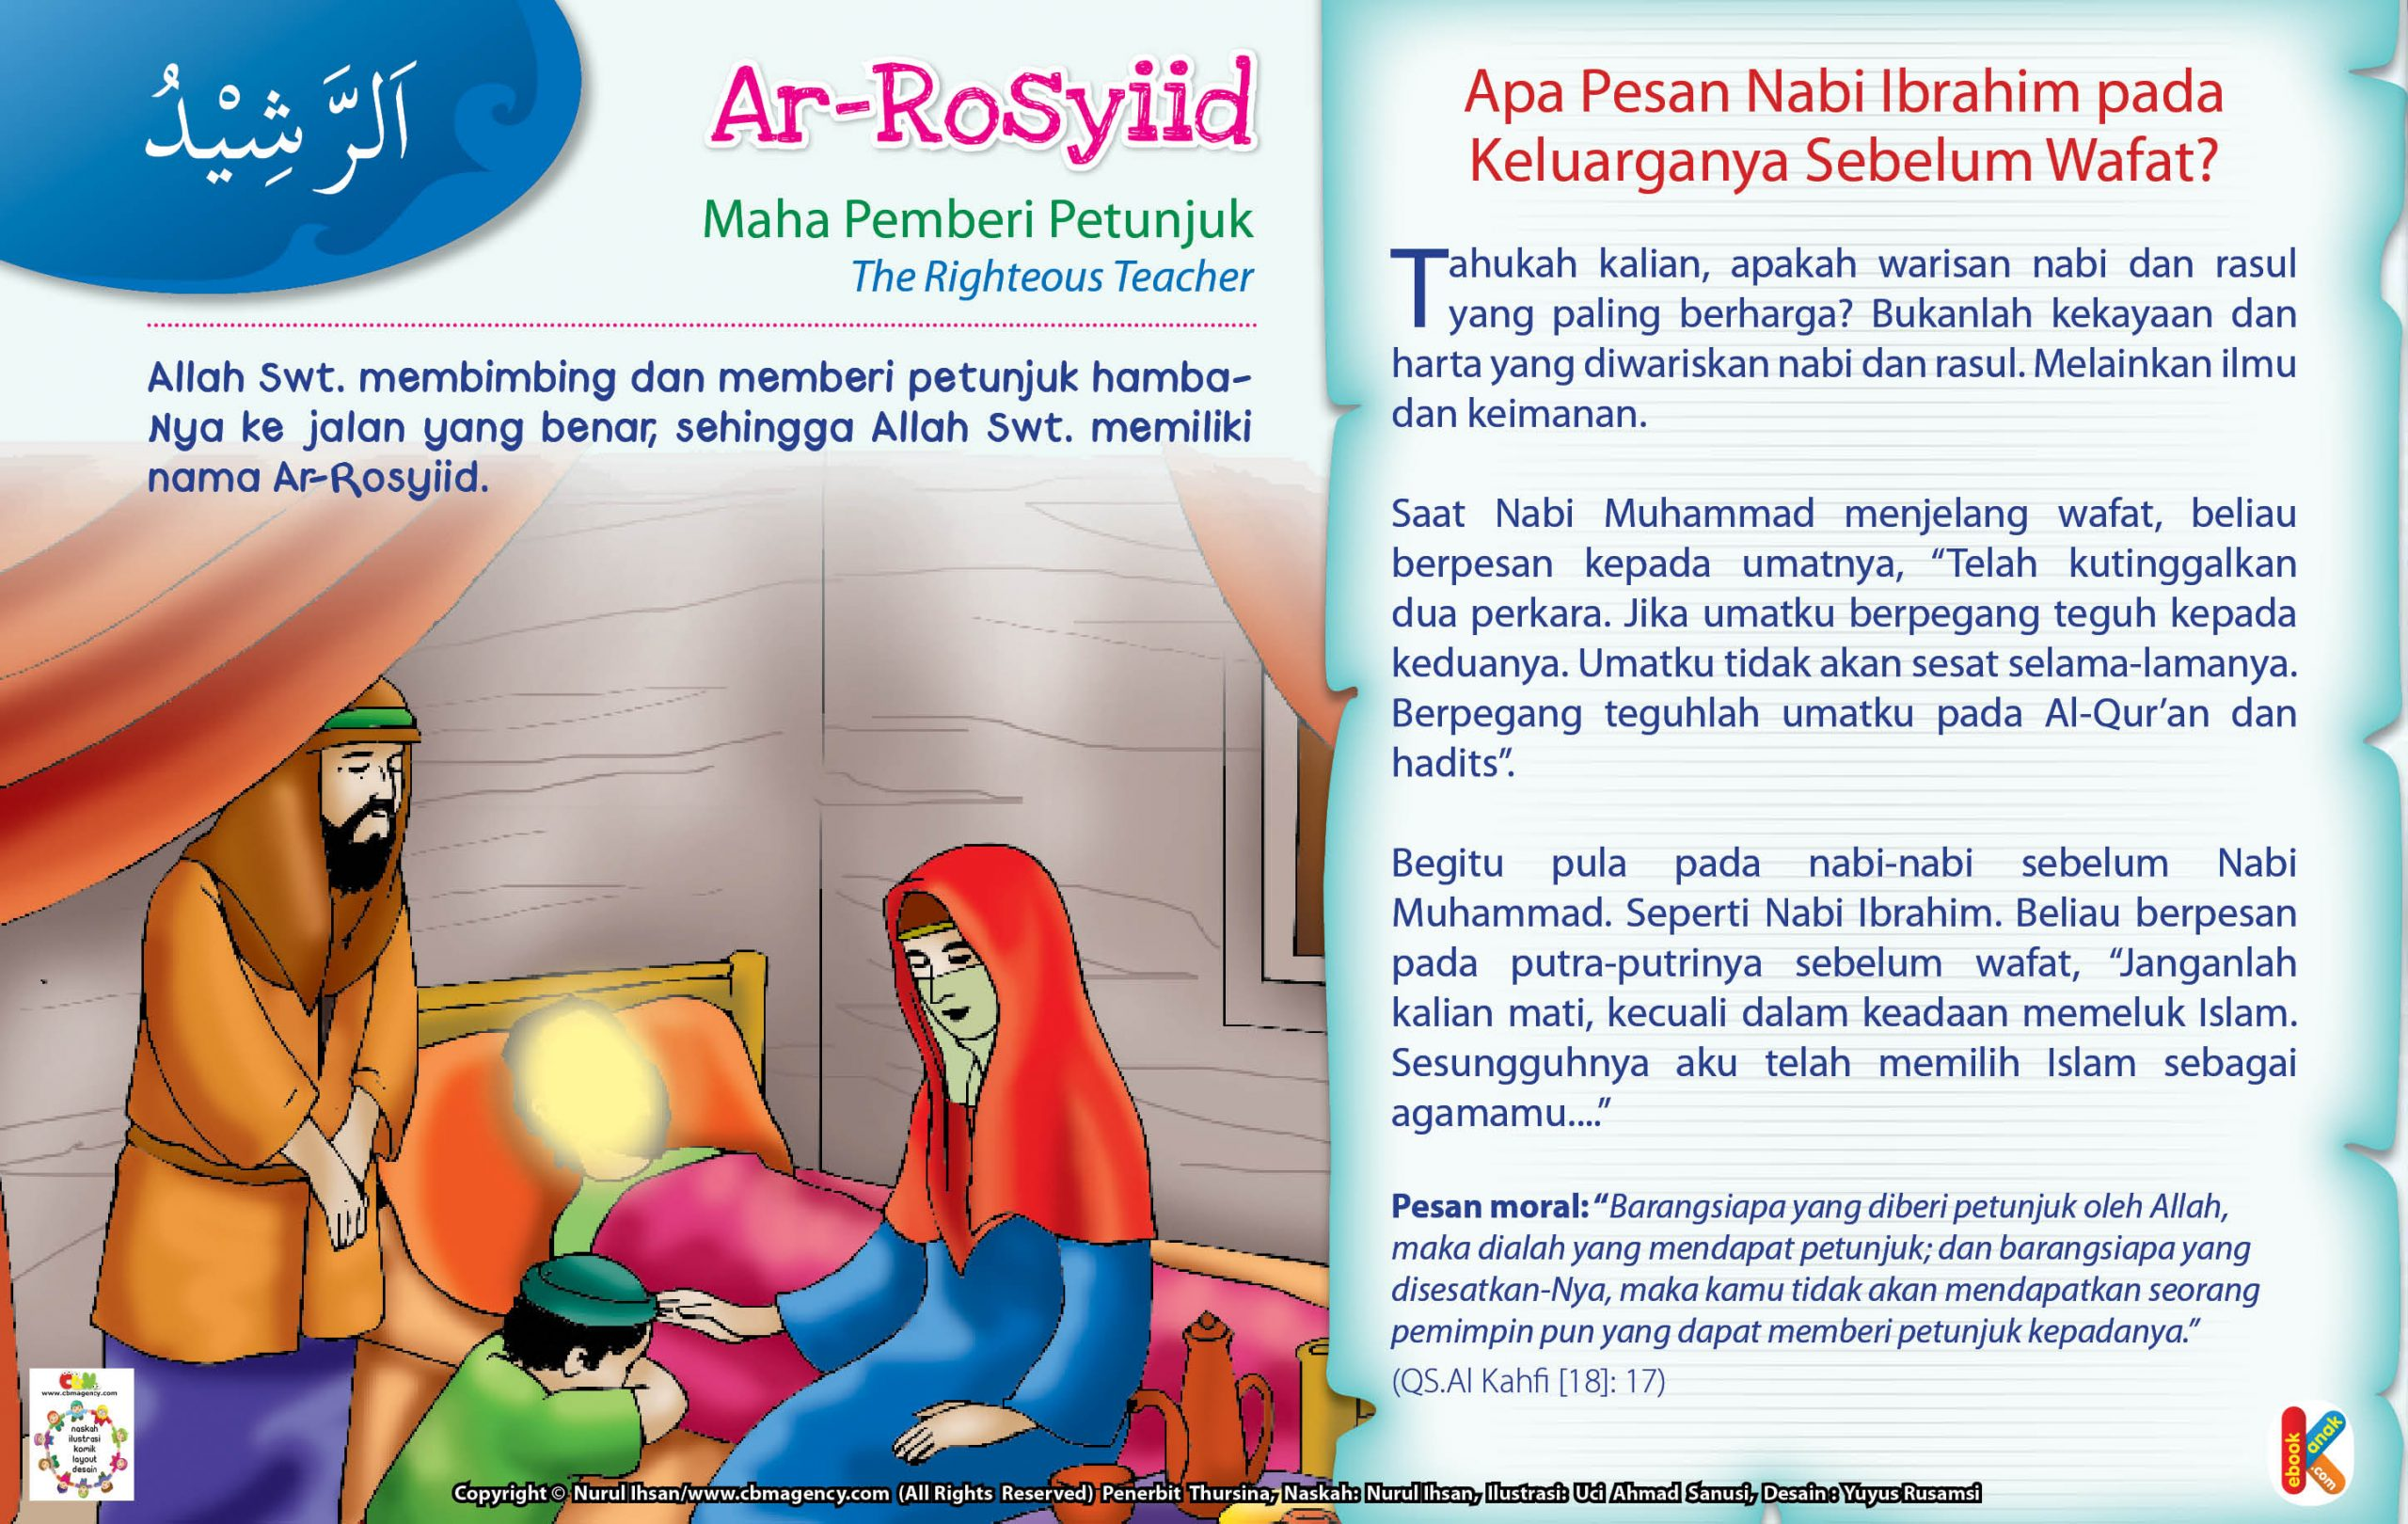 Saat Nabi Muhammad Saw. menjelang wafat, beliau berpesan kepada umatnya untuk berpegang teguh kepada Al-Quran dan hadits.